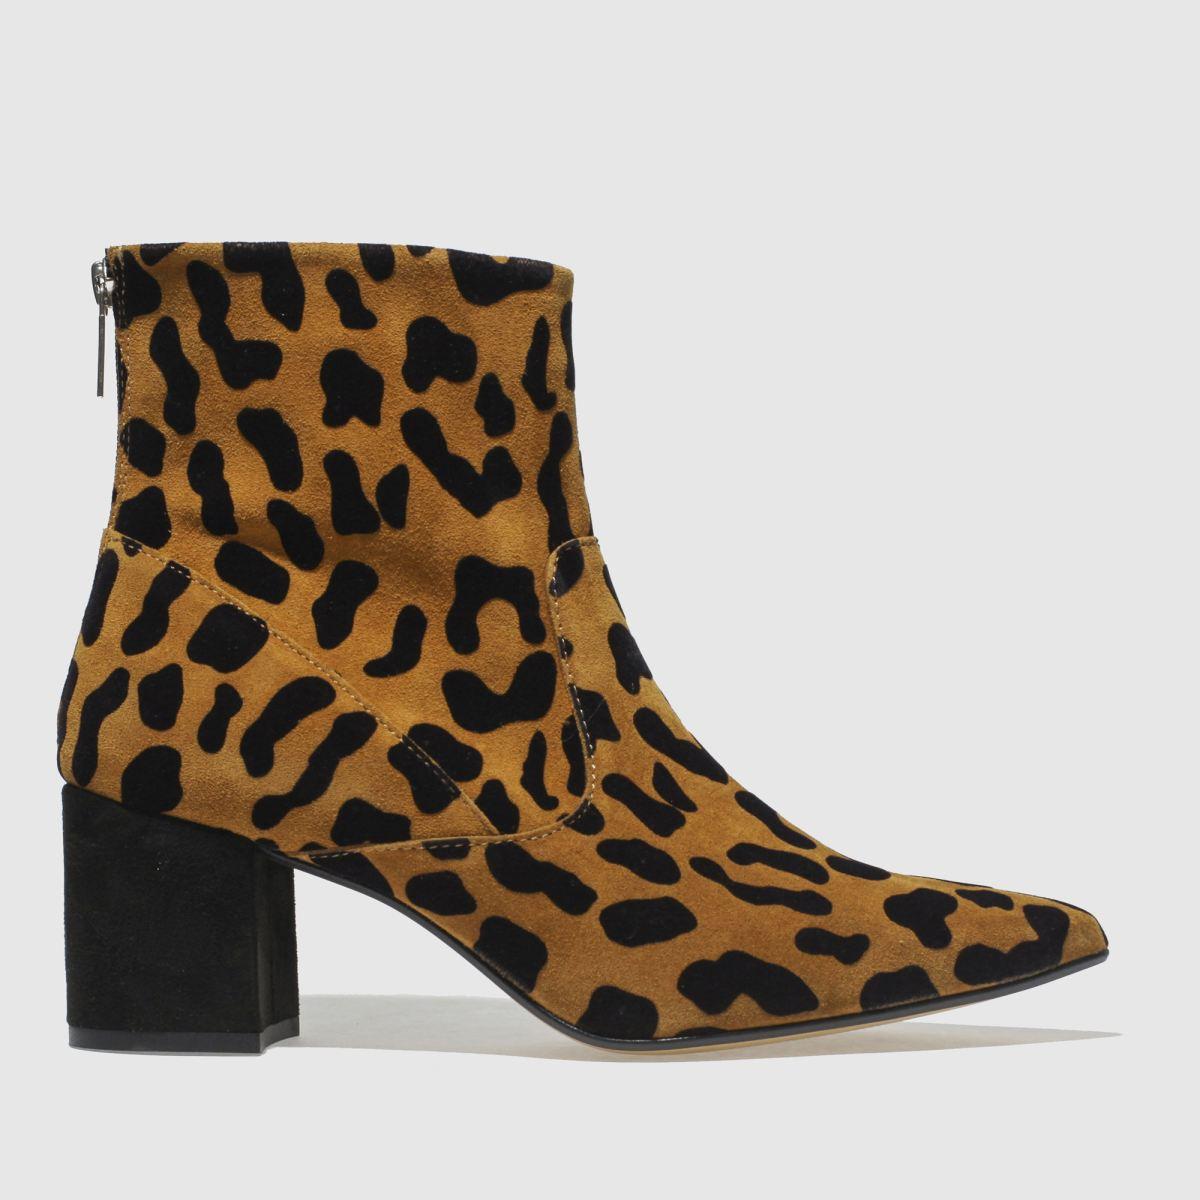 Schuh Tan & Black Banger Boots